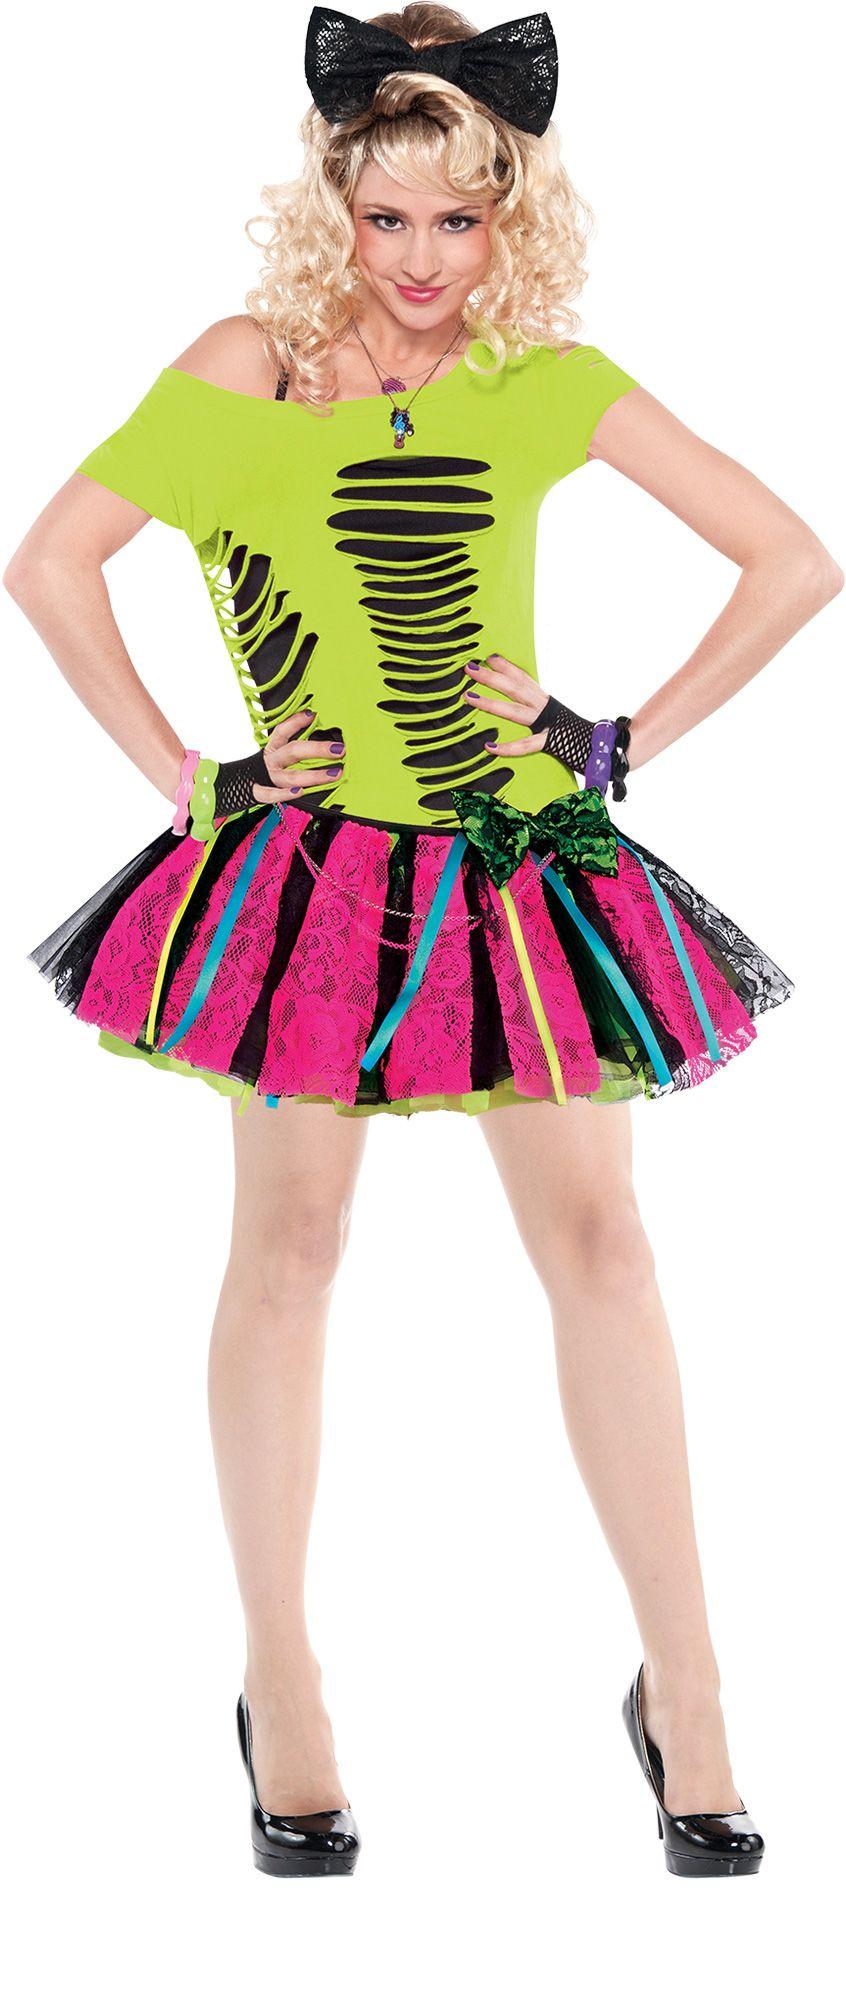 Make Your Costume - 80s Womens Neon Tutu #1